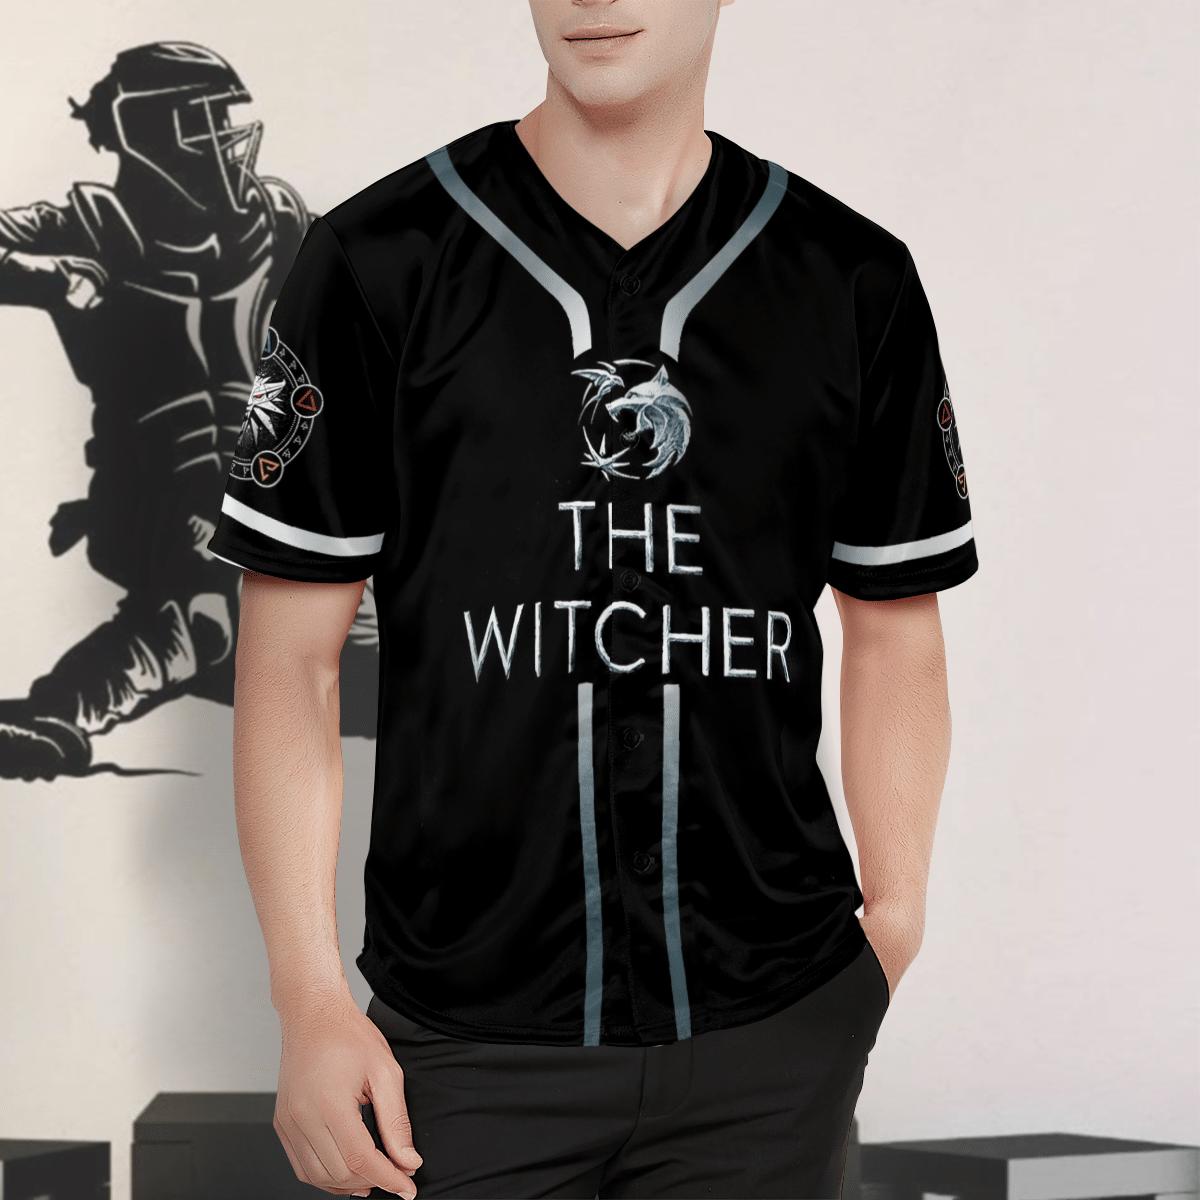 The Witcher Baseball Jersey Shirt